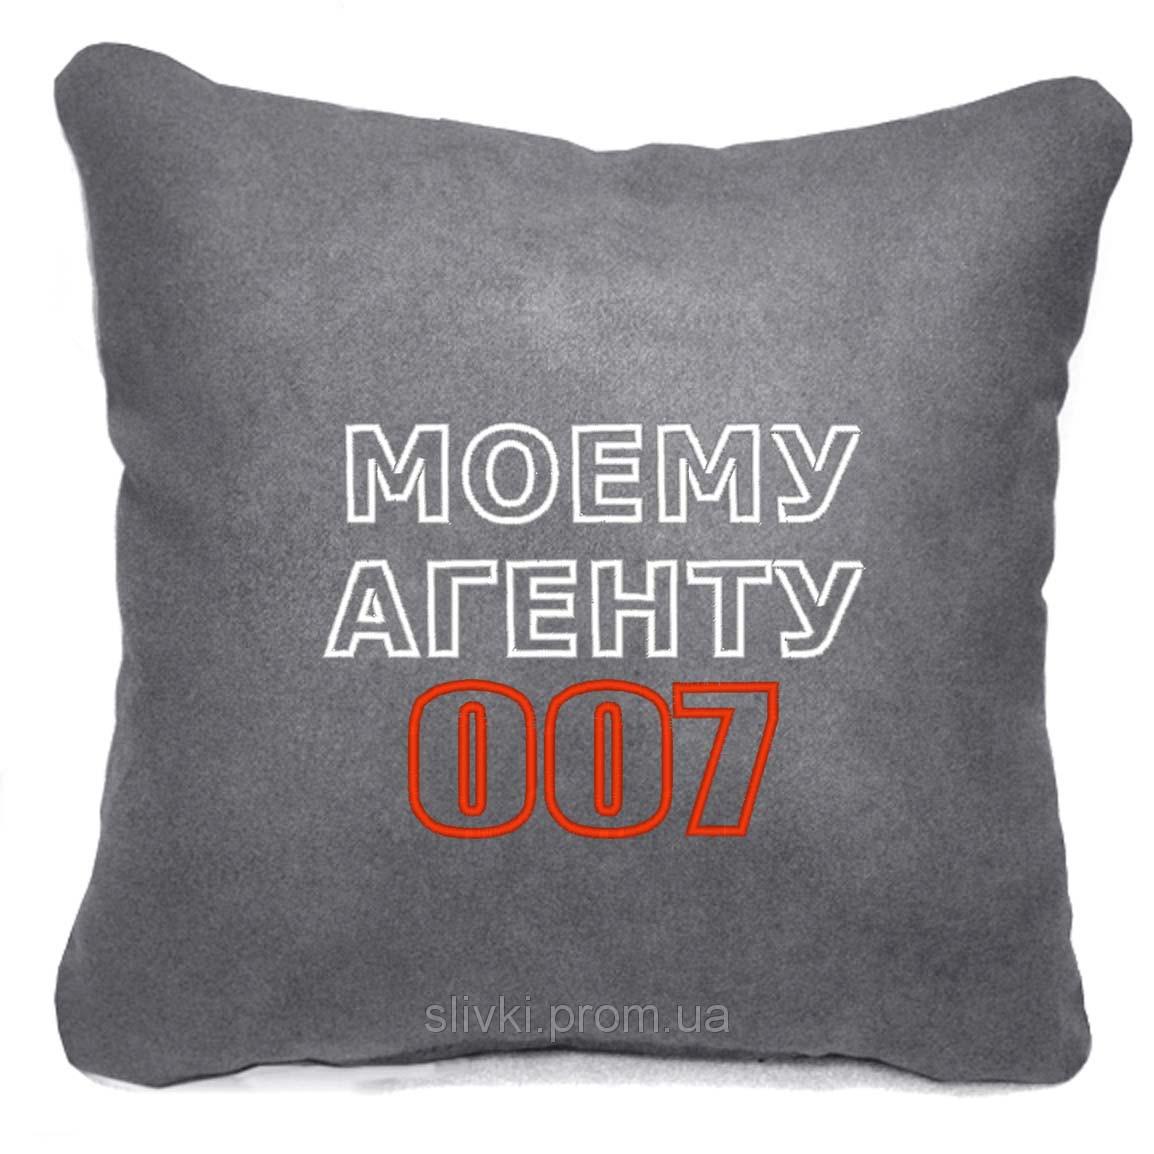 "Сувенирная подушка "" Моему агенту 007 "" №82"